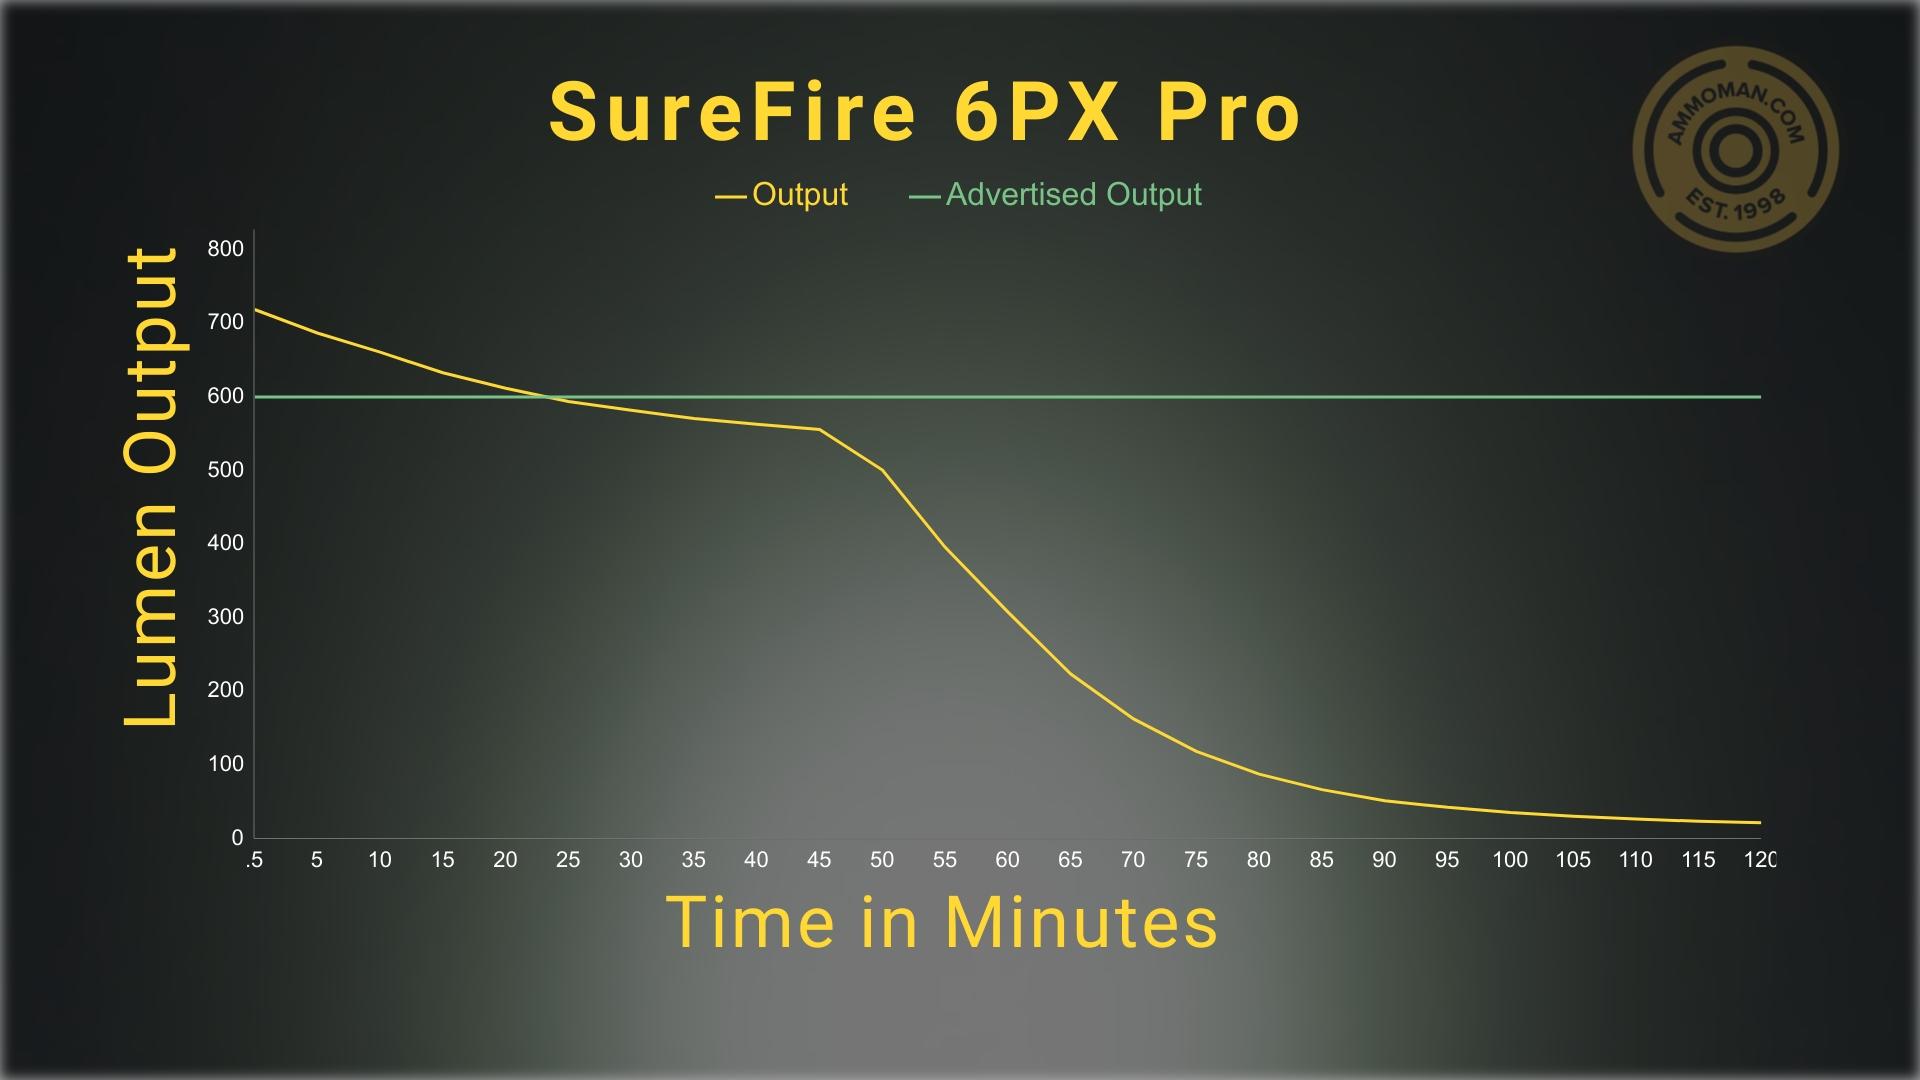 lumen test results for the SureFire 6PX Pro